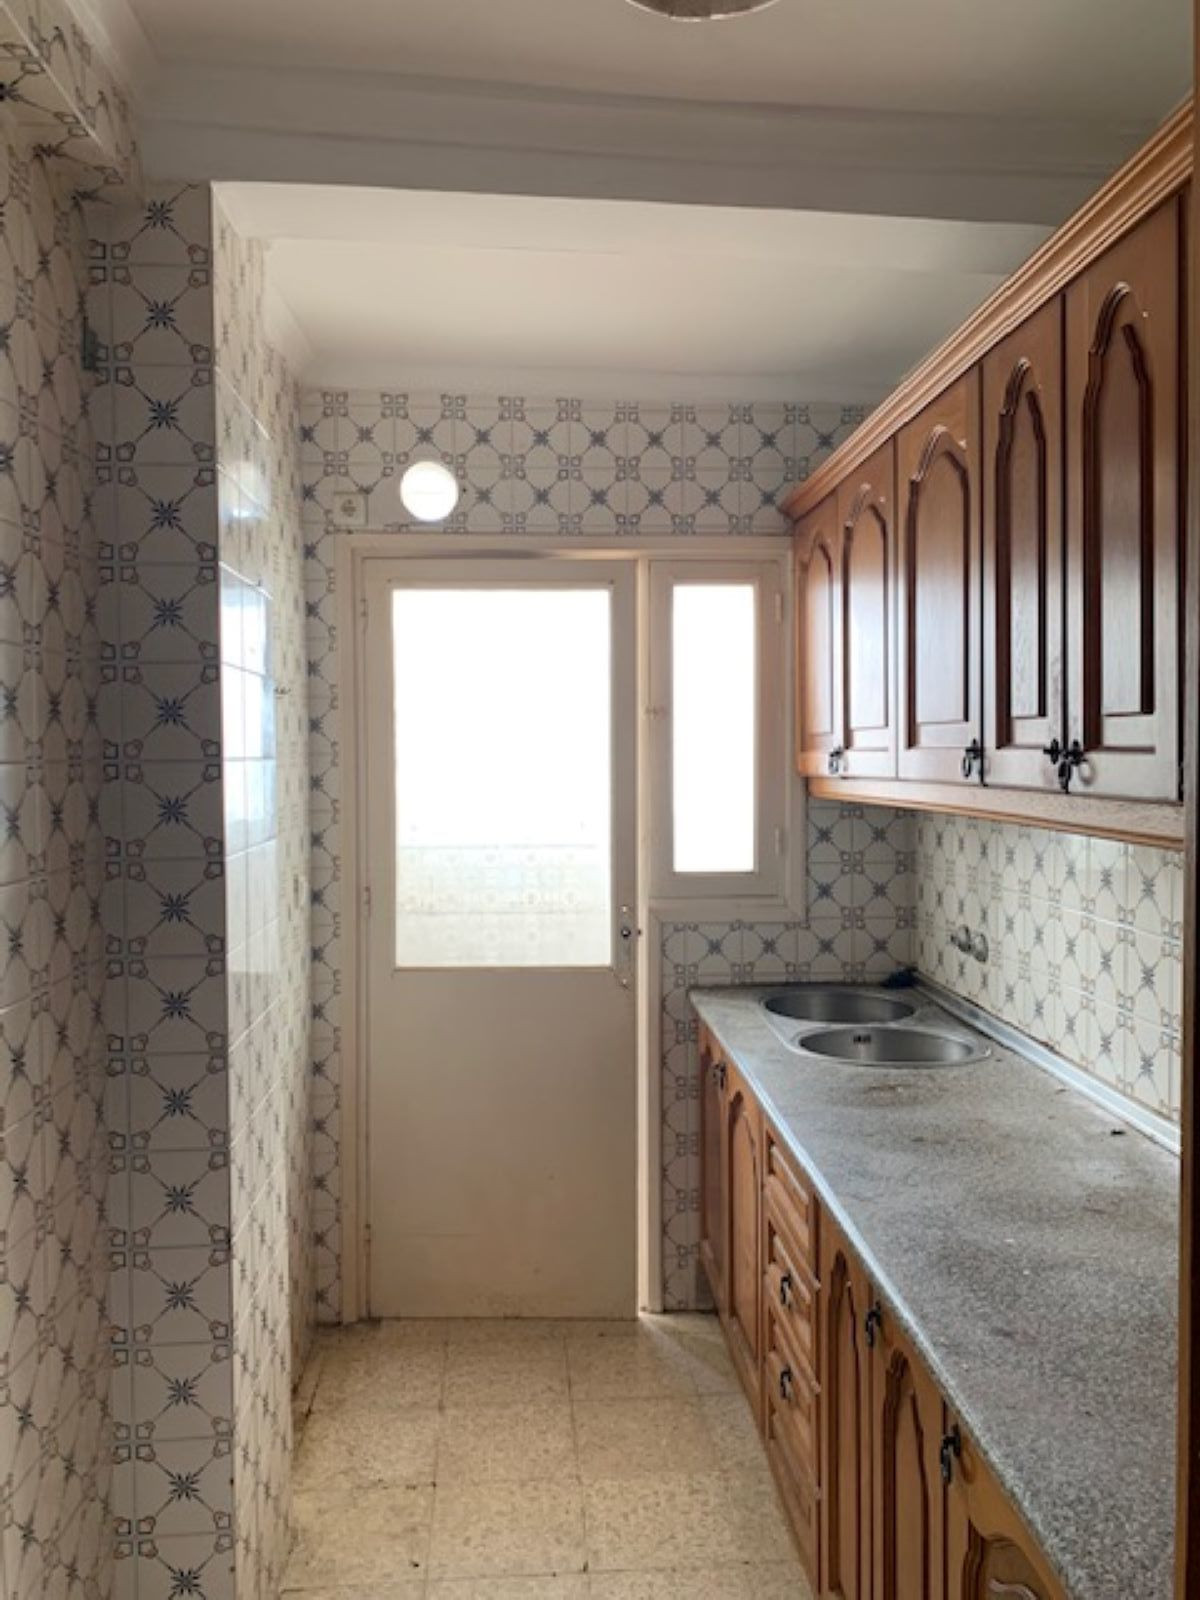 Apartamento - Estepona - R3503539 - mibgroup.es